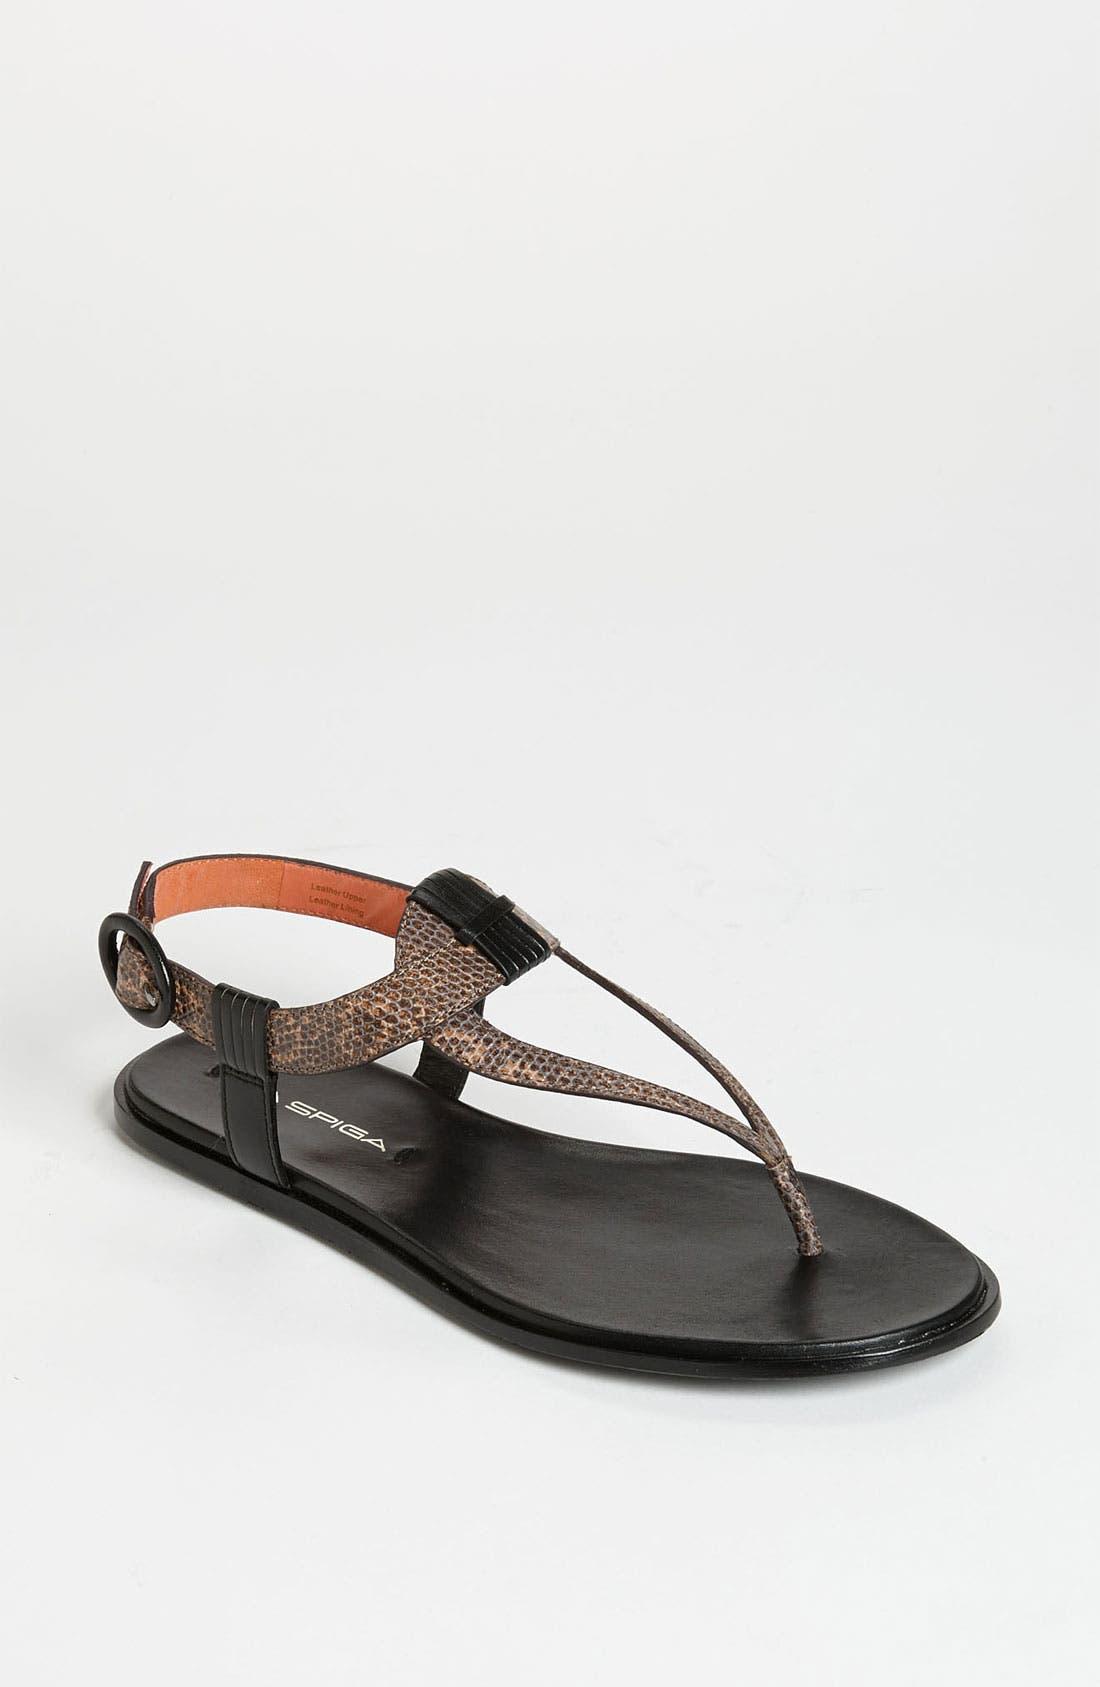 Main Image - Via Spiga 'Capris' Sandal